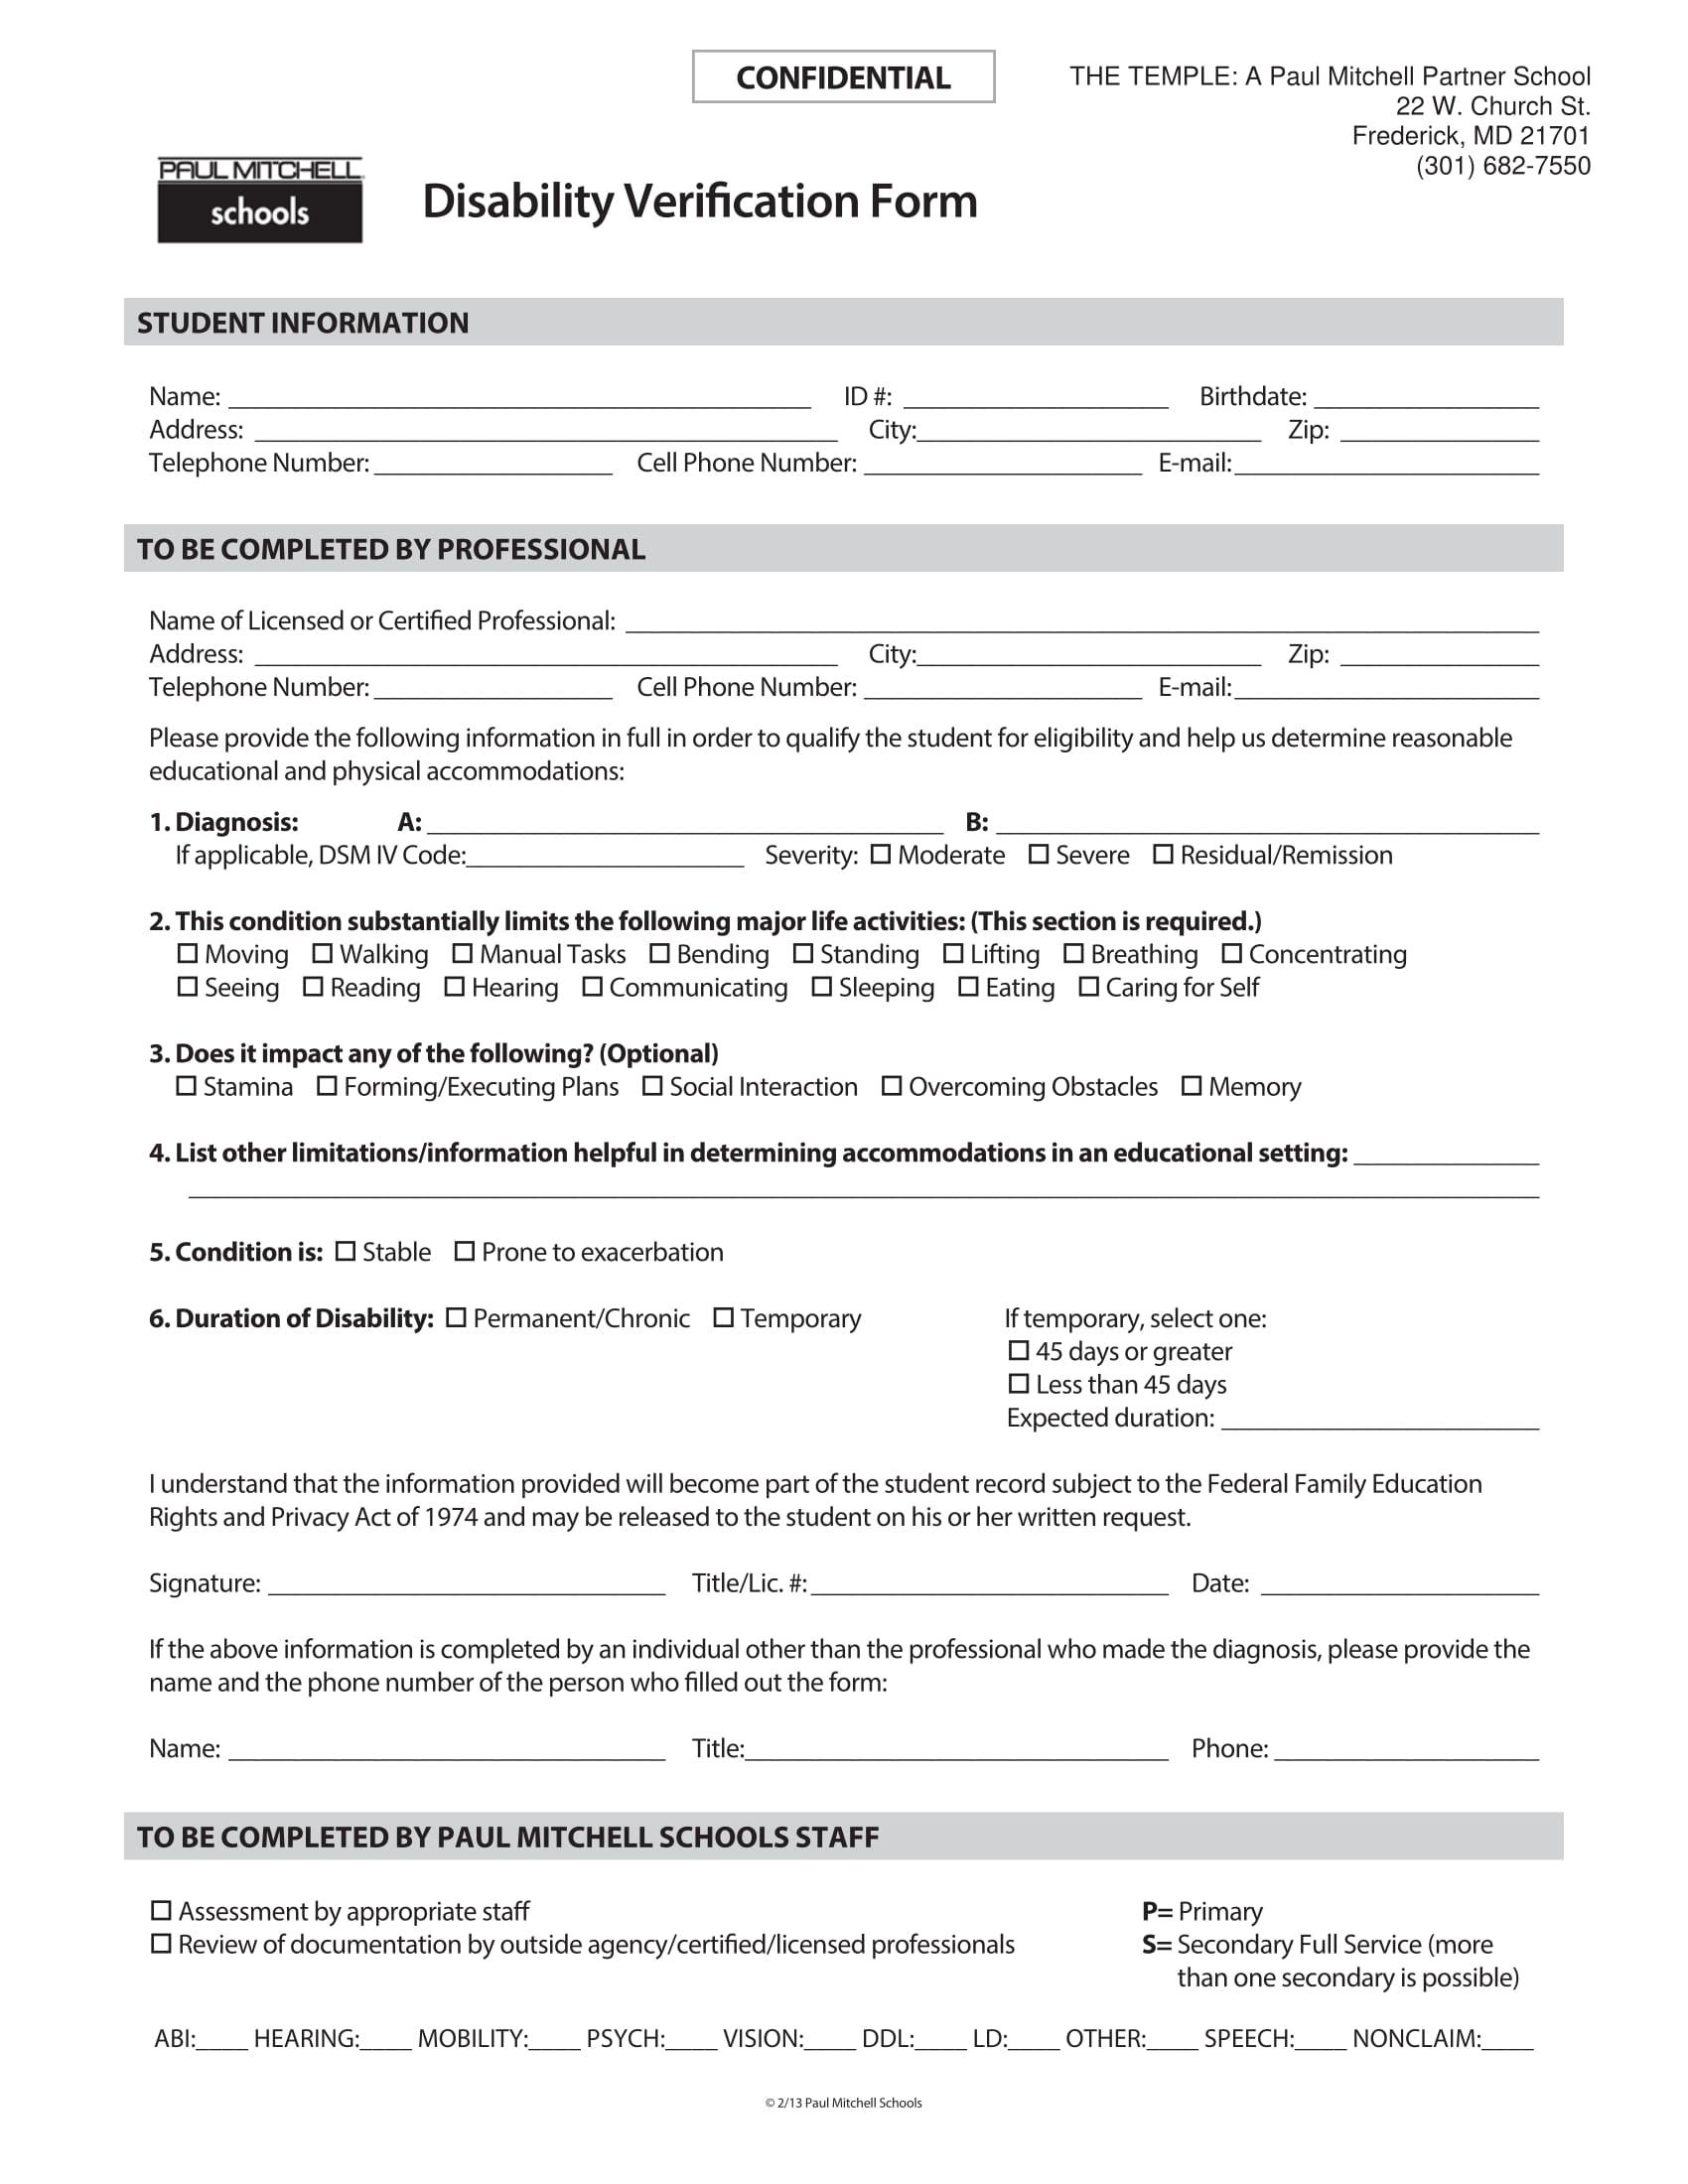 confidential disability verification form 3